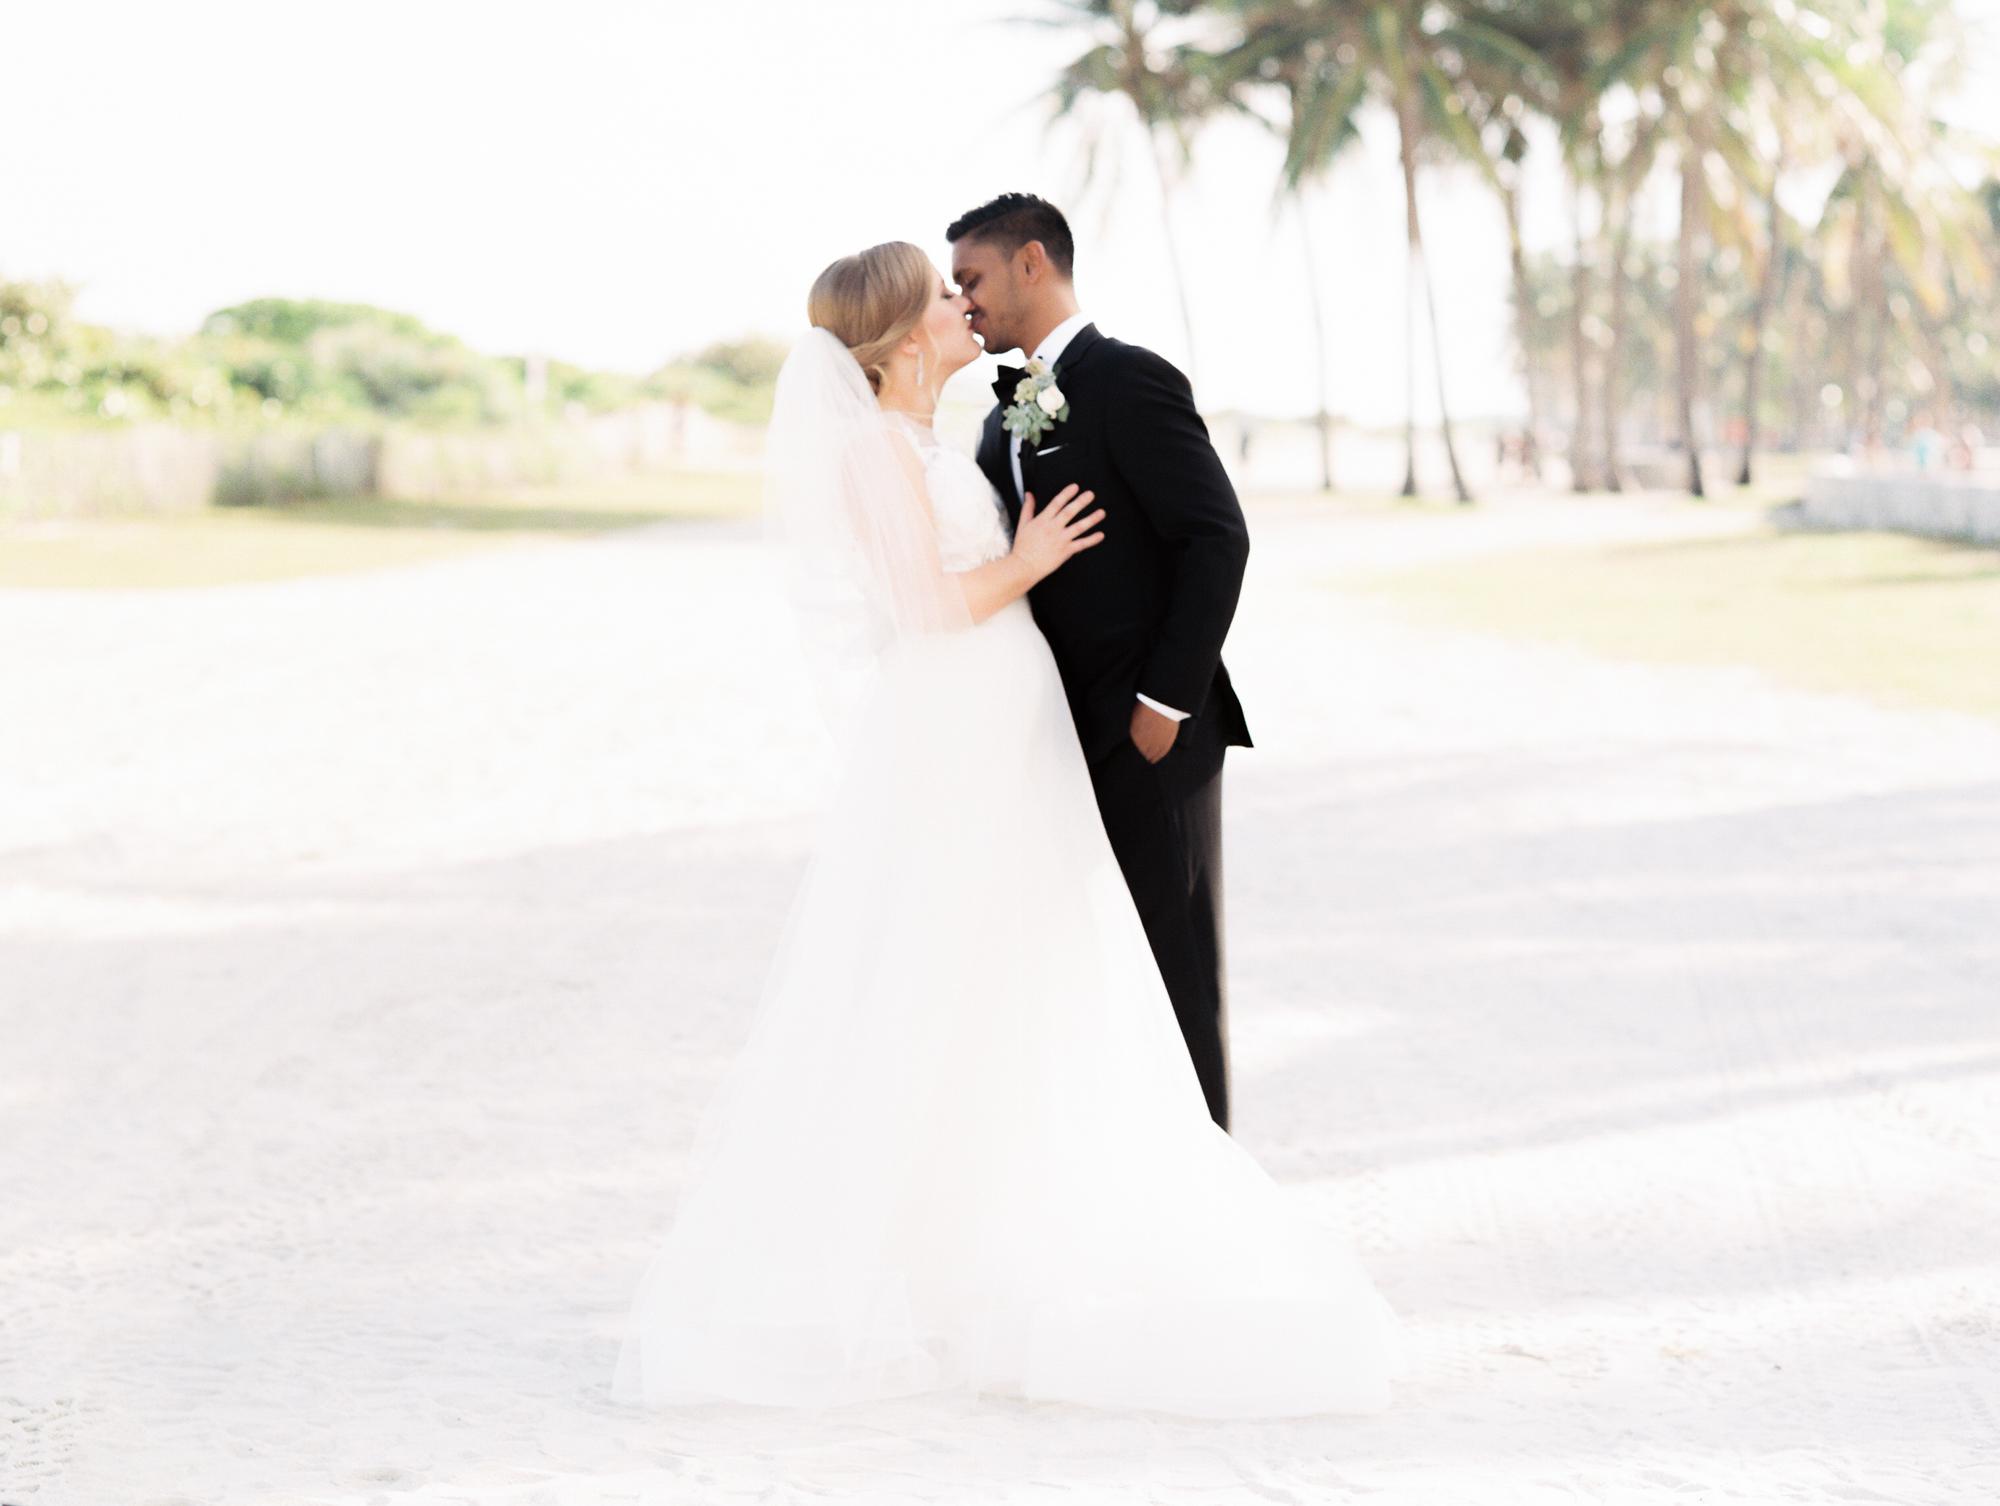 betsy-hotel-wedding-south-beach-miami-charleston-south-carolina-destination-wedding-photographer-9.jpg